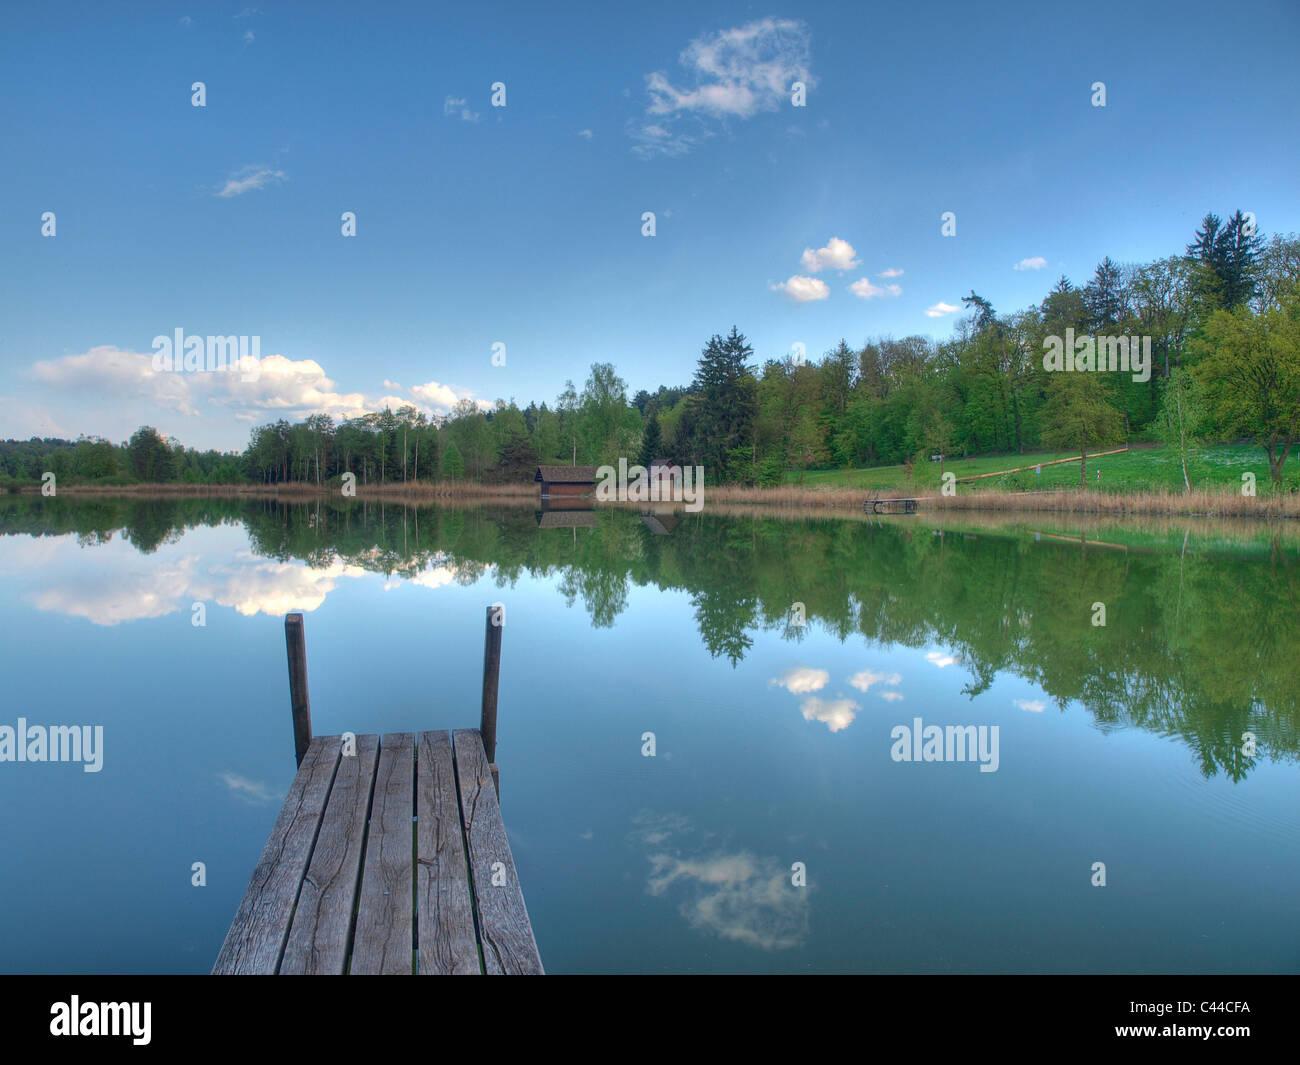 Blue, spring, himmel, idyl, footbridge, lake, wood, forest, water, clouds, canton Zurich, Switzerland, Husemersee, - Stock Image